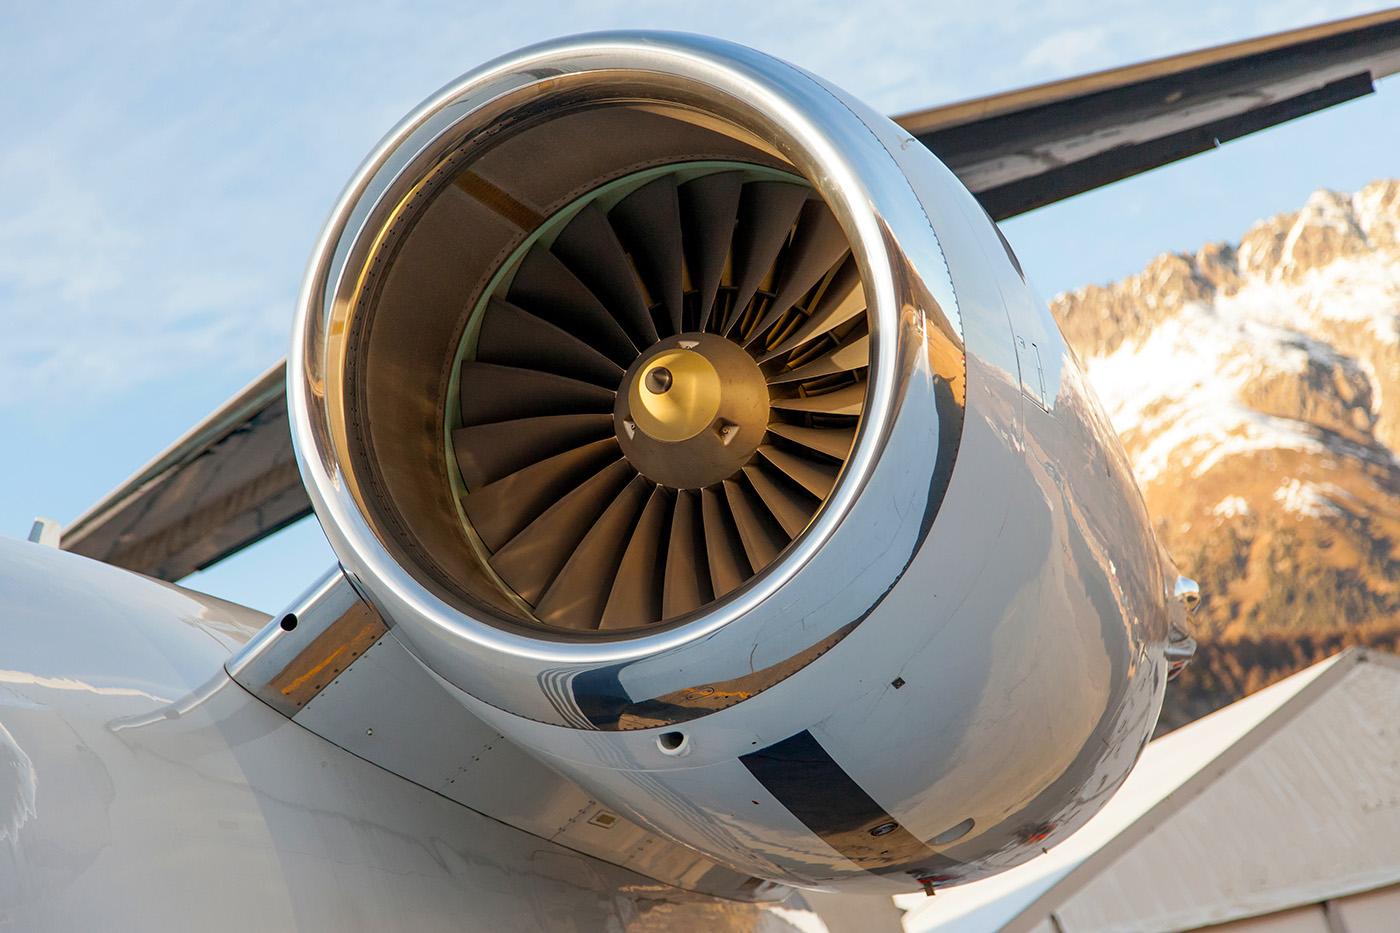 Aeroplane Parts